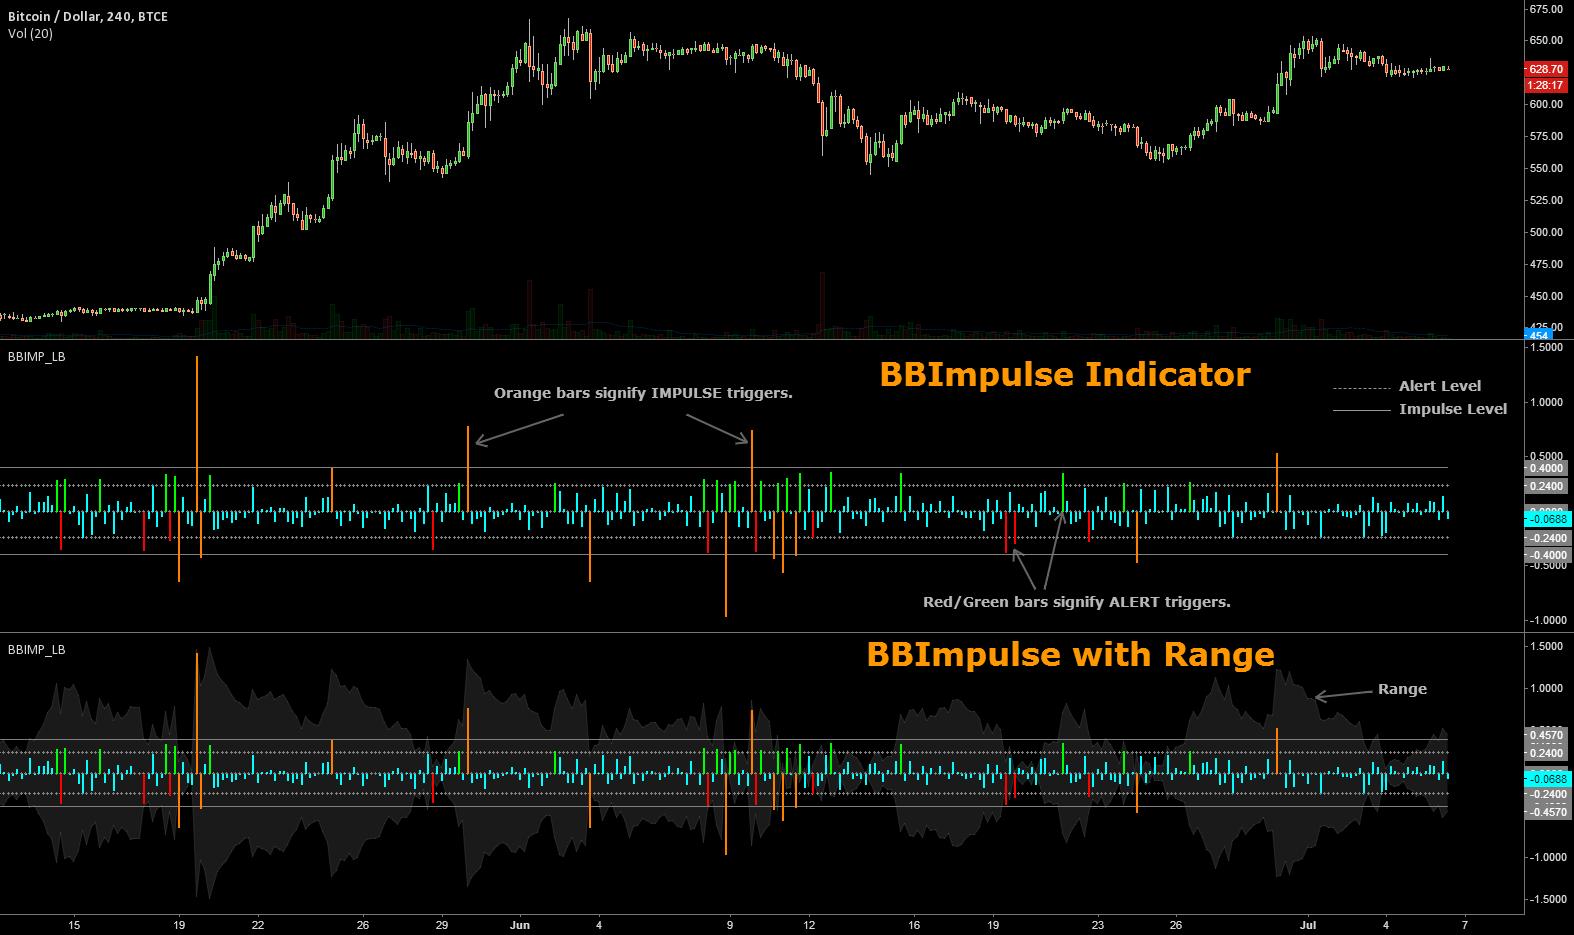 BBImpulse Indicator